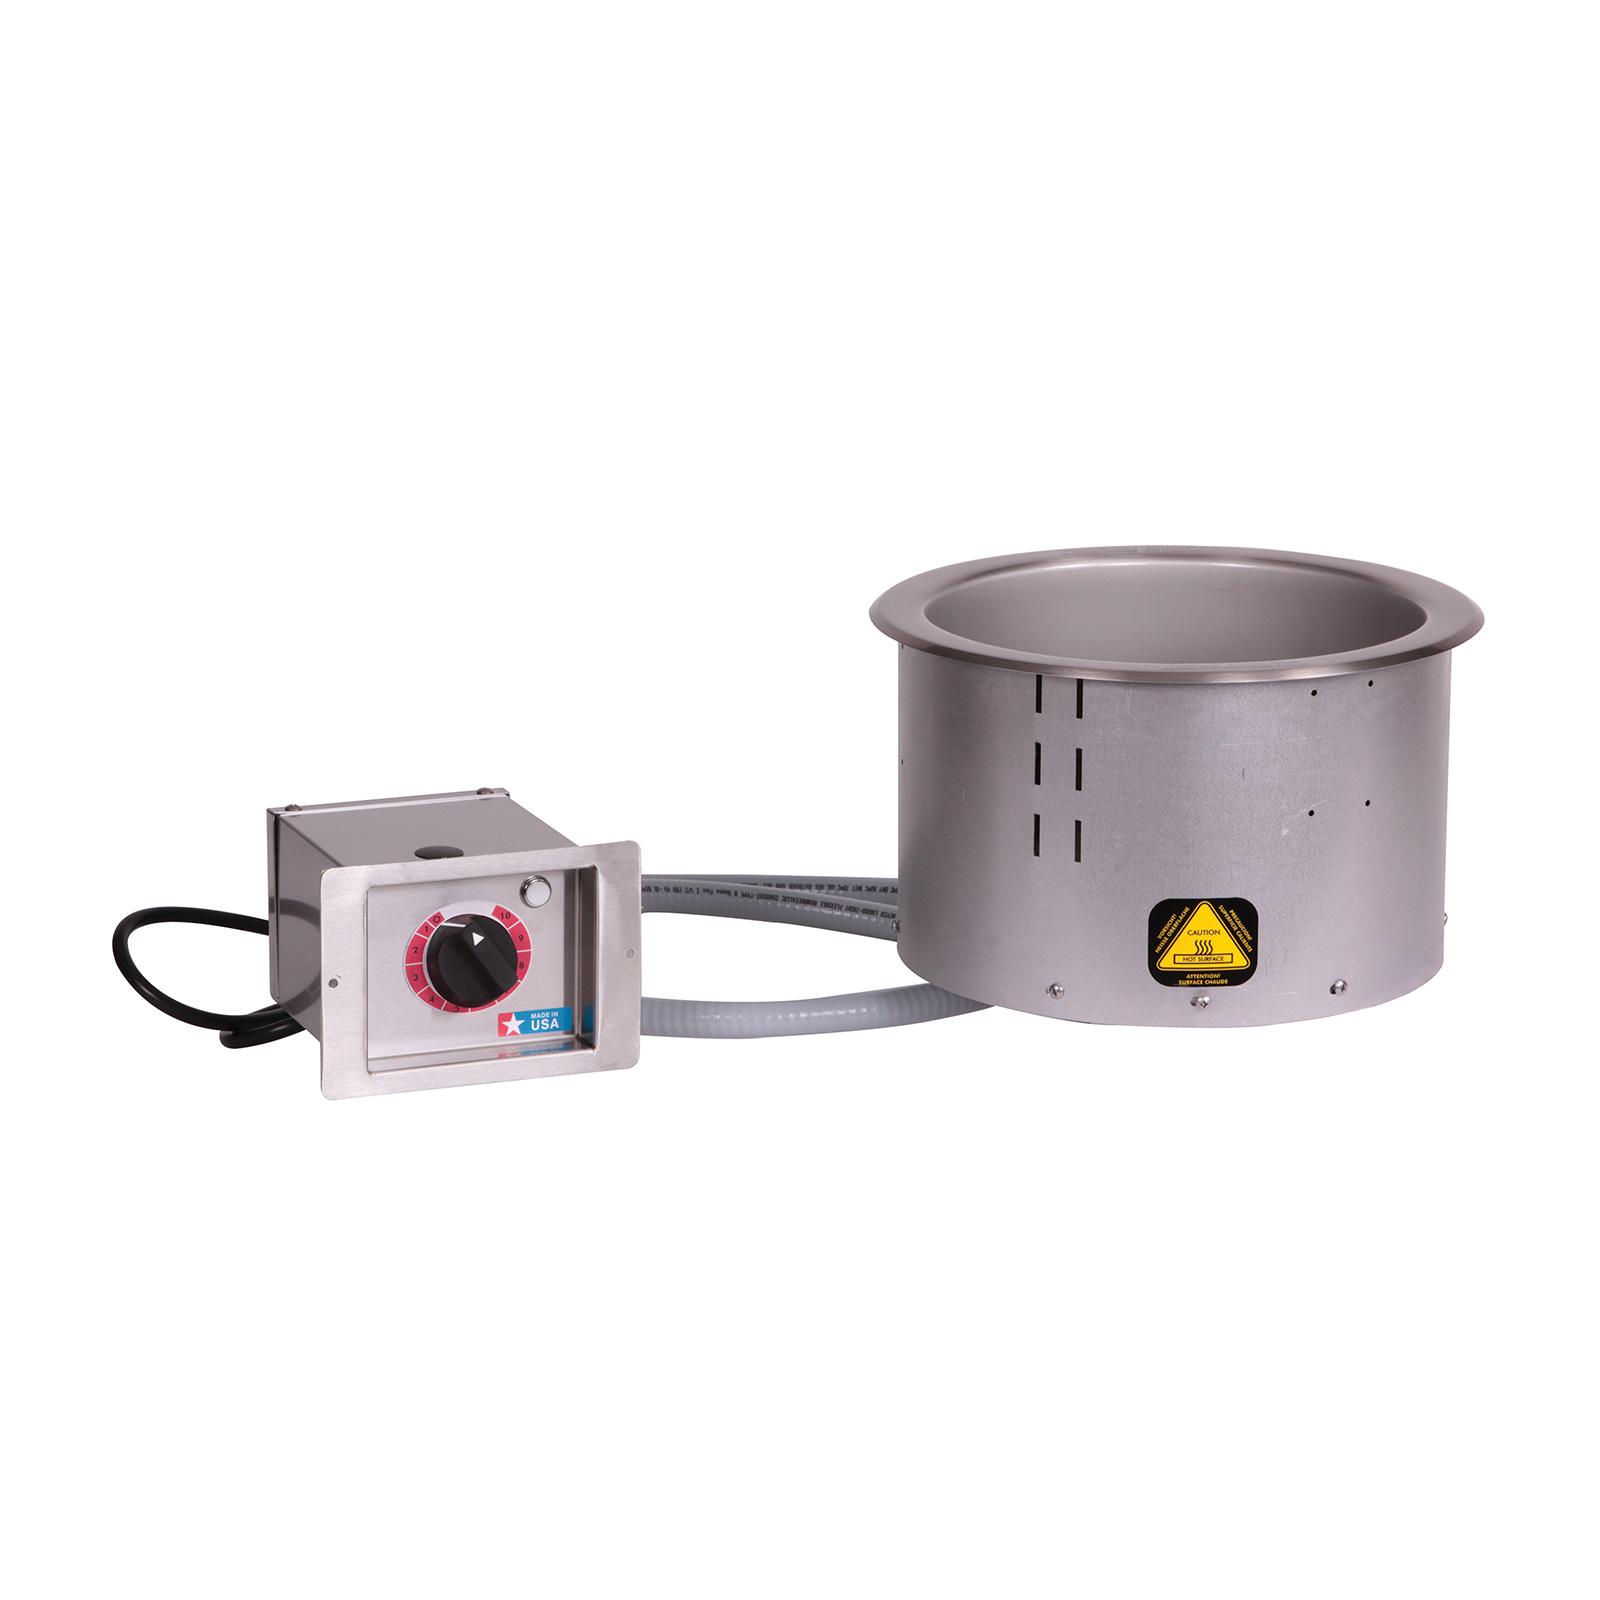 Alto-Shaam 1100-RW hot food well unit, drop-in, electric